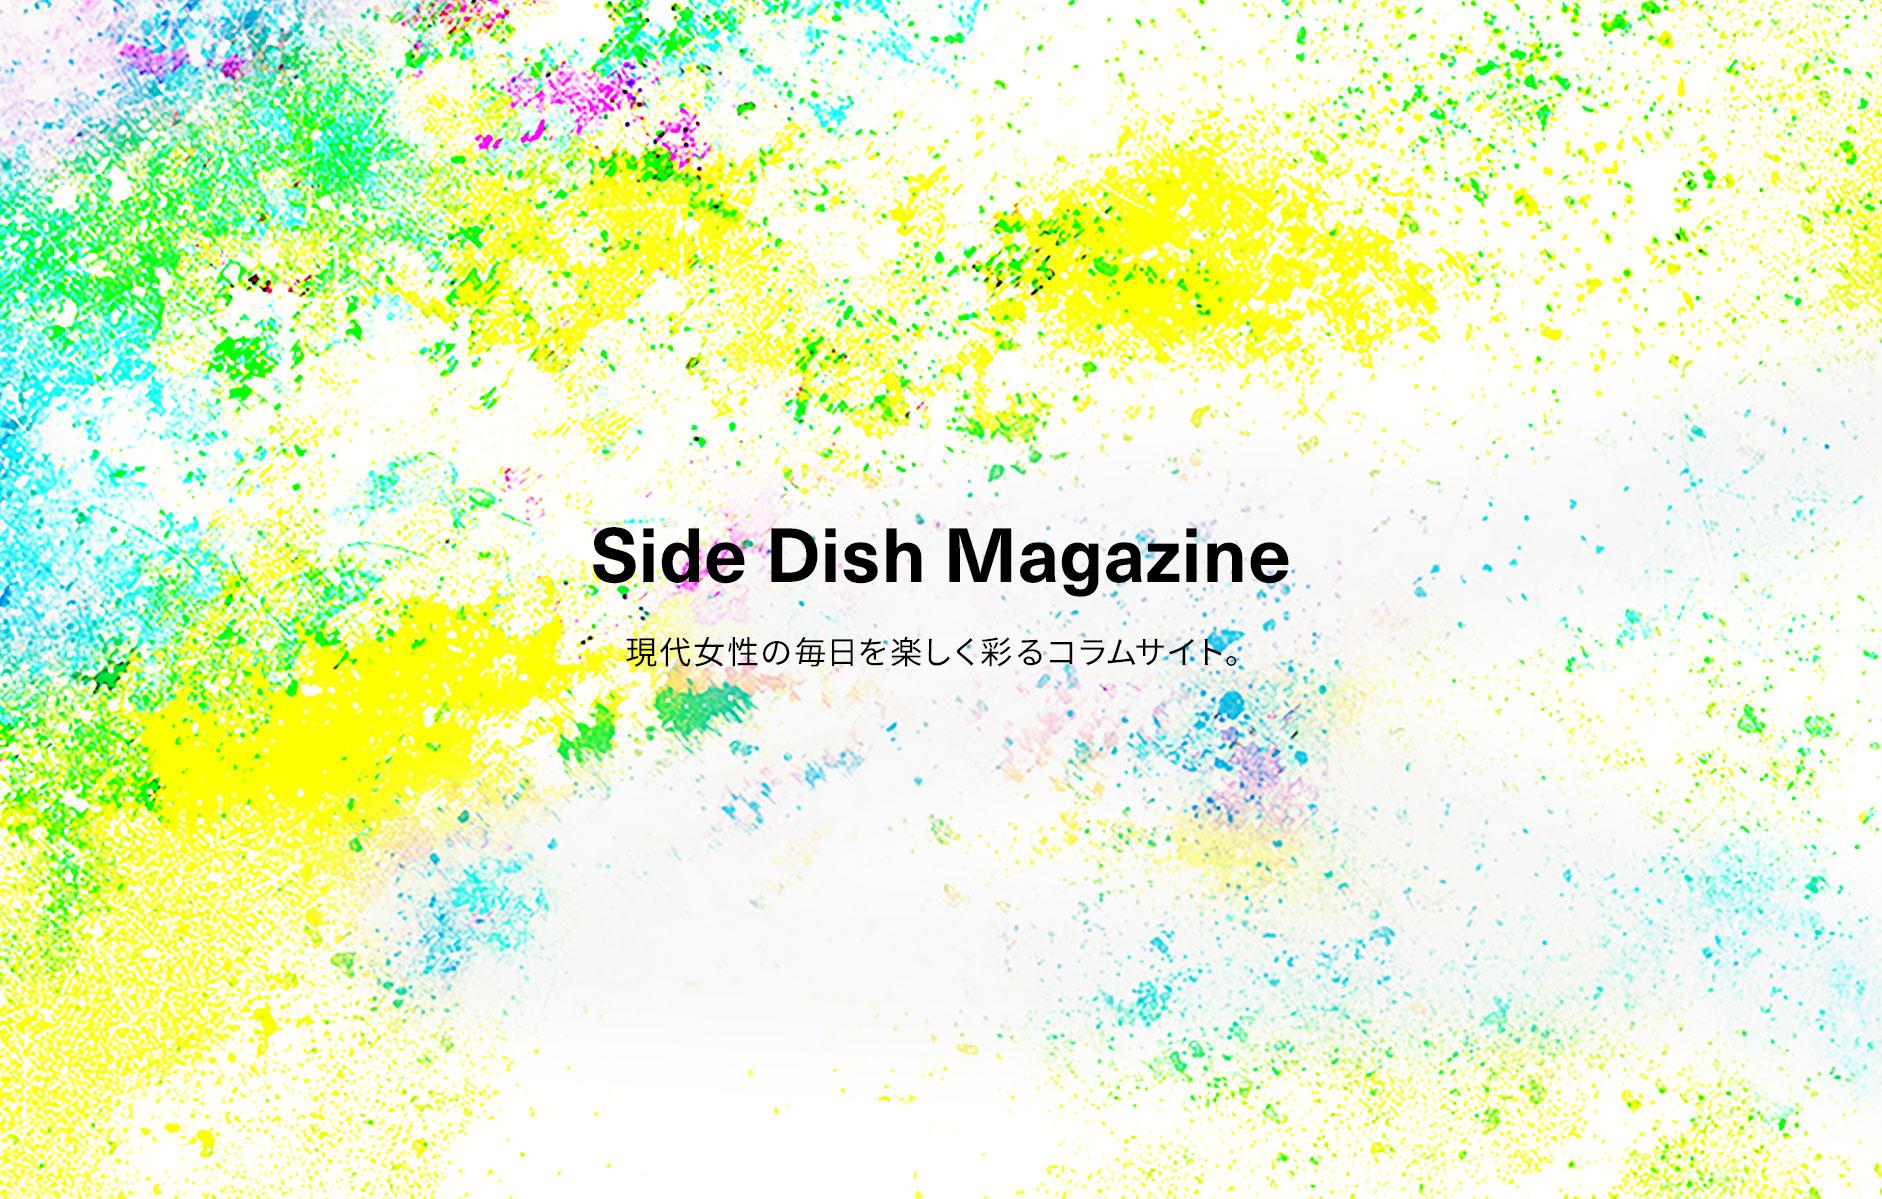 SIDEDISHmagazines